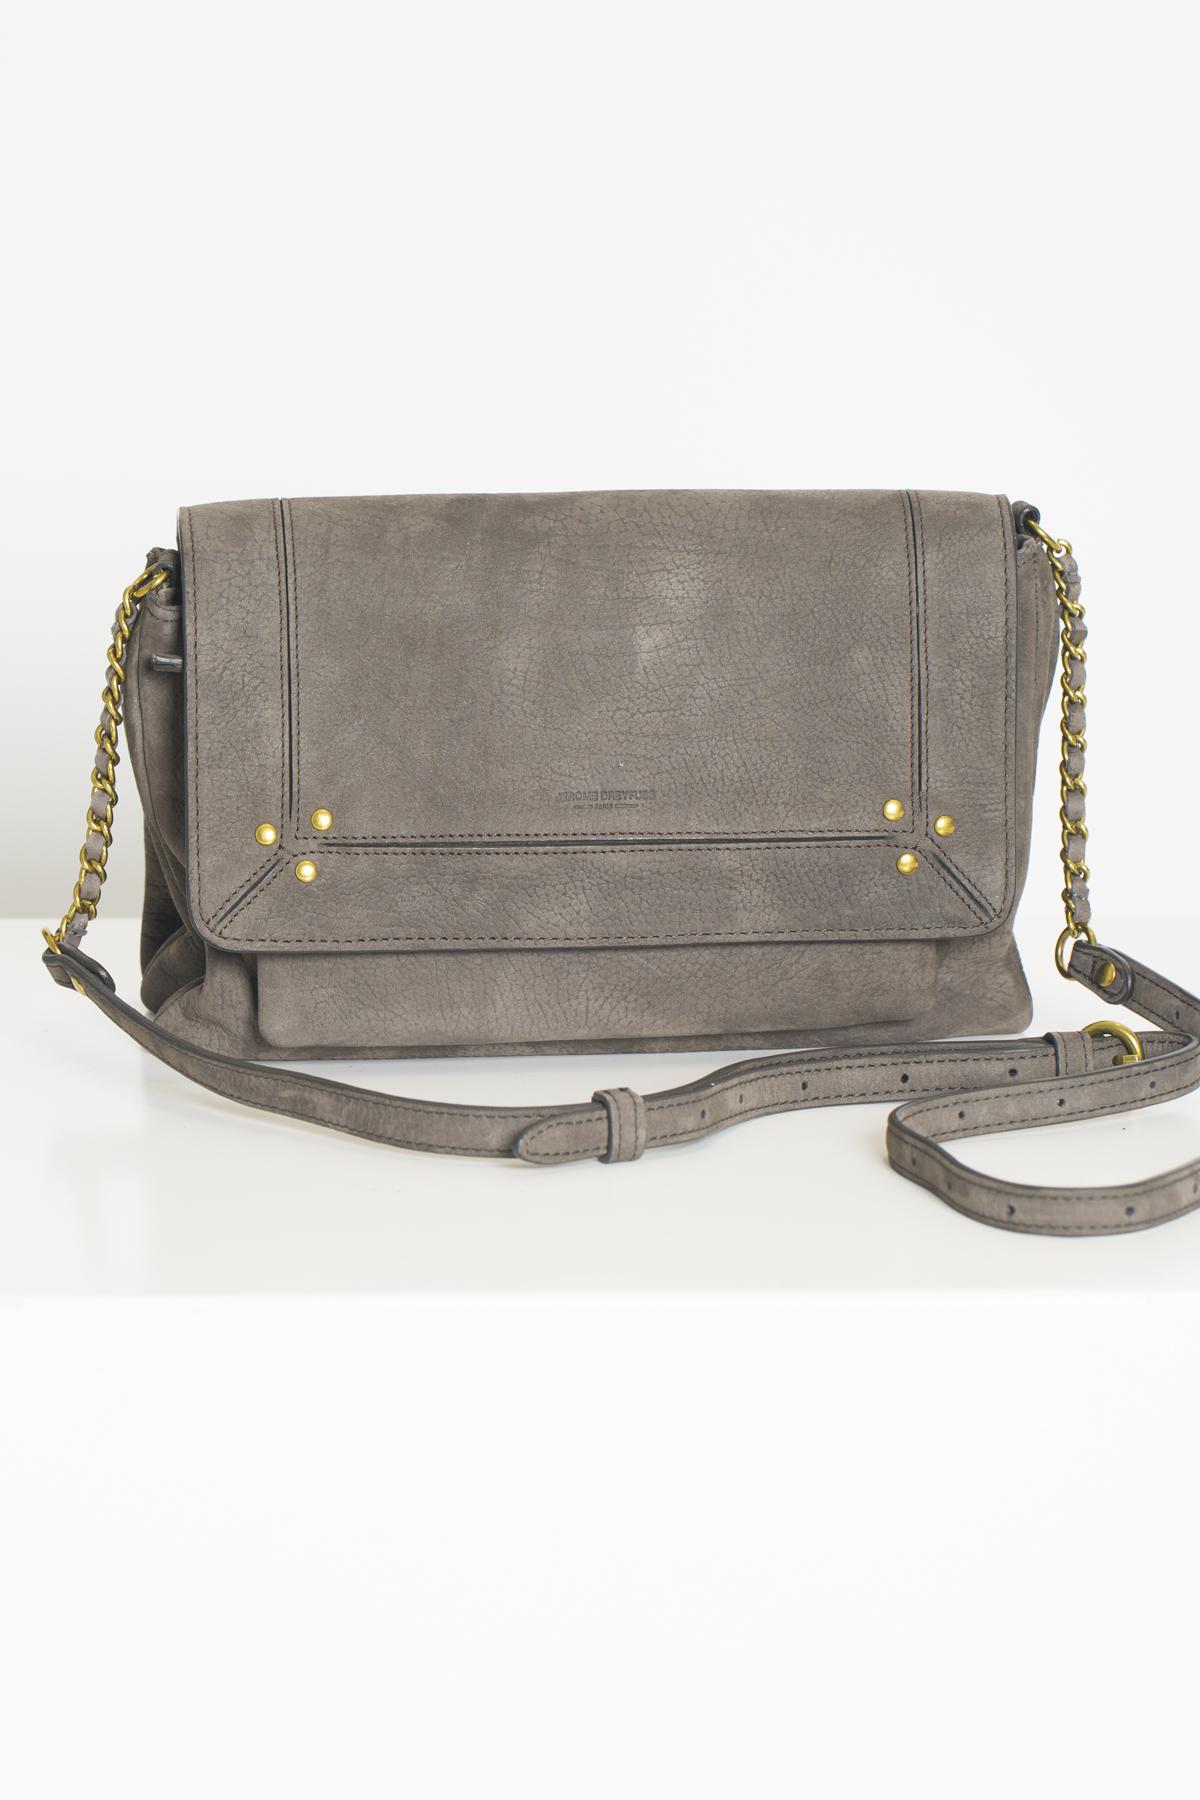 charly-medium-elephant-suede-leather-bag-jerome-dreyfuss-matchboxathens